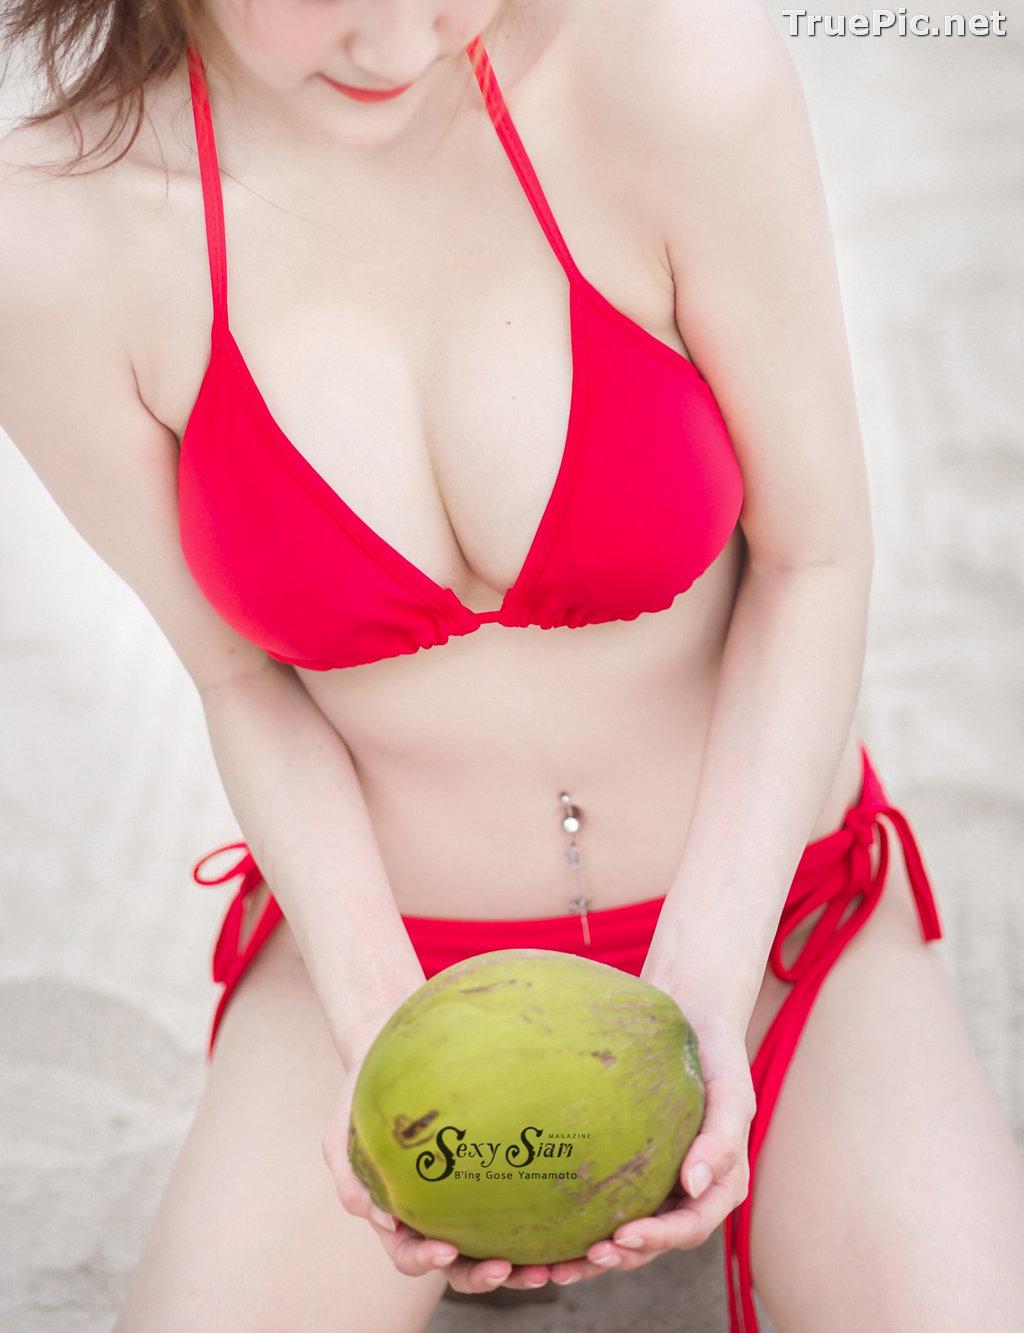 Image Thailand Model - Nitchakan Thongruangkitti - Red Fern Bikini - TruePic.net - Picture-7